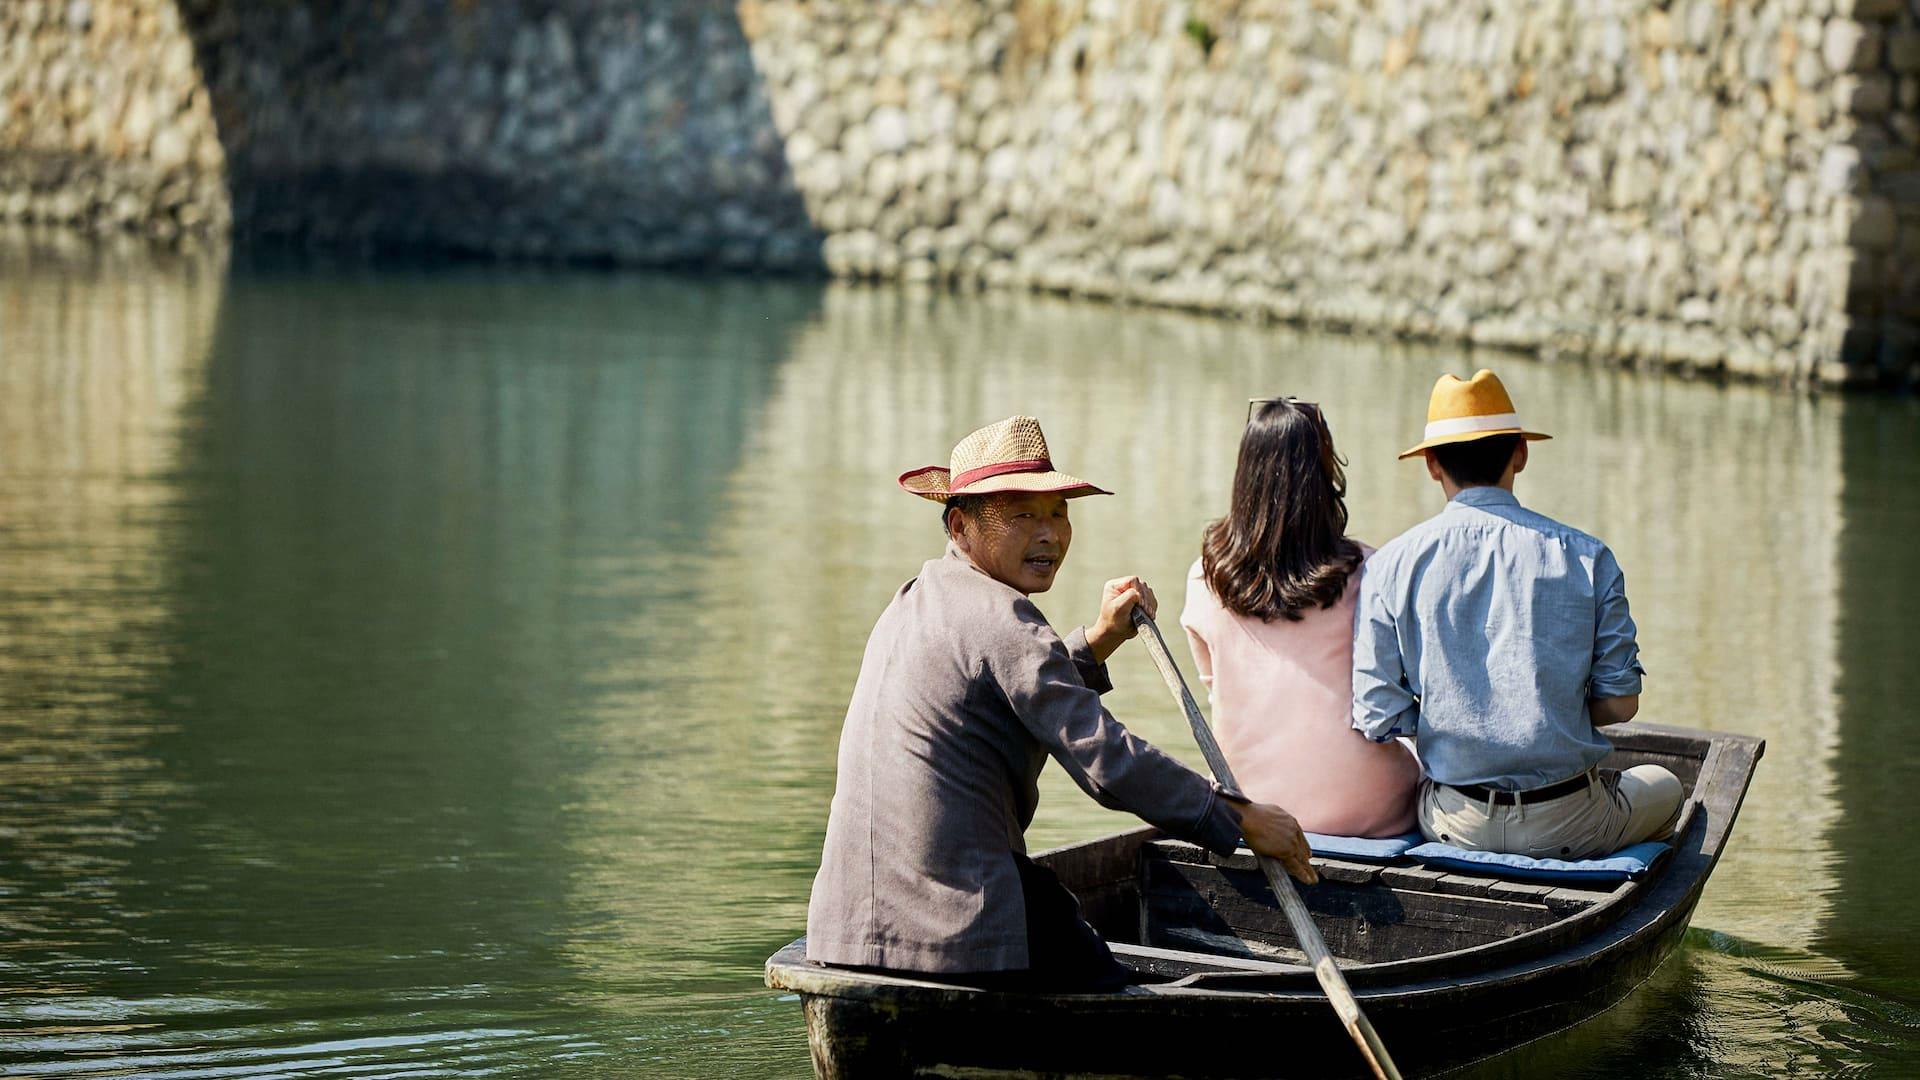 Lifestyle Recreation Couple Boat